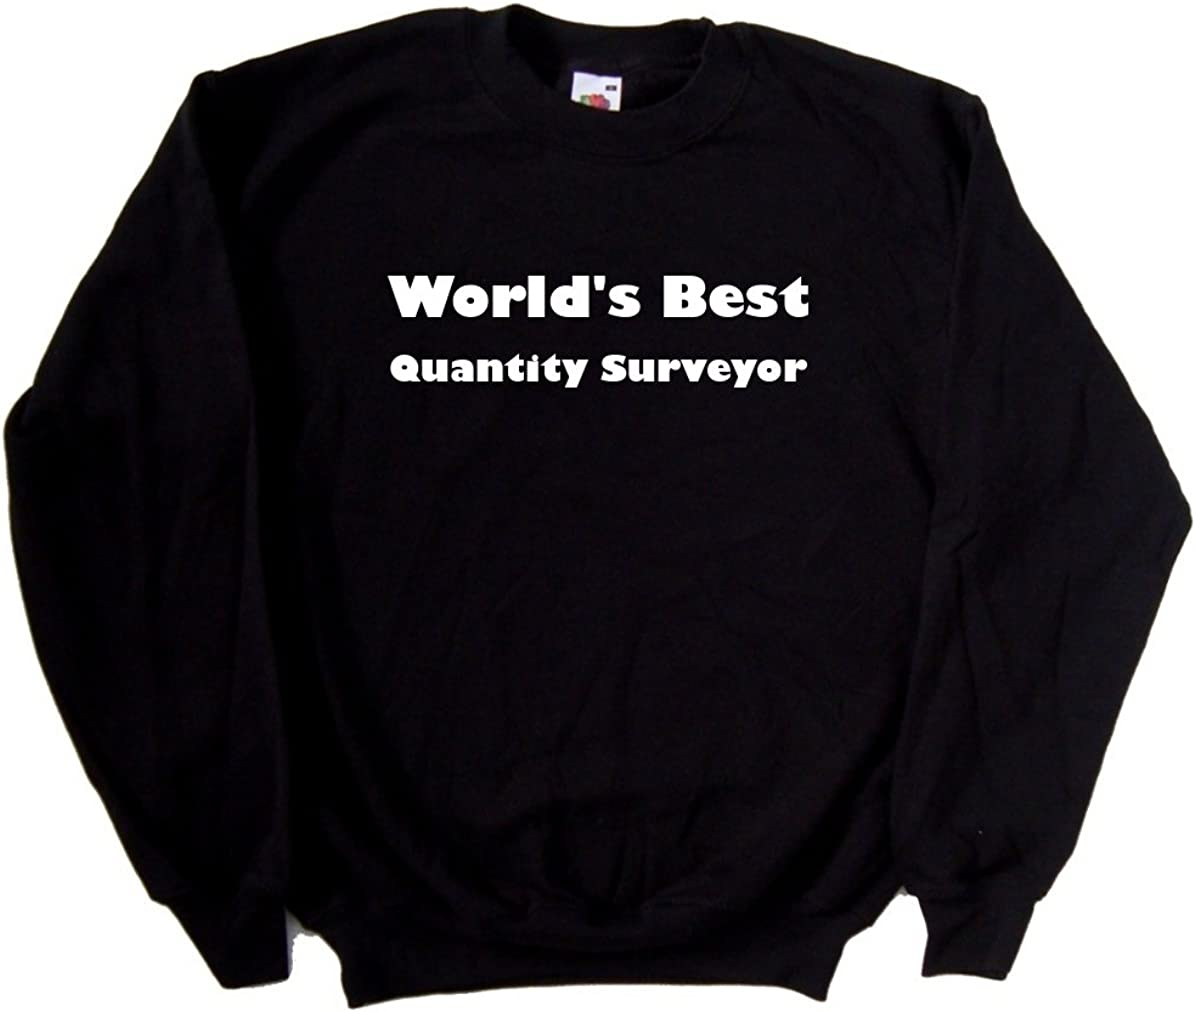 Worlds Best Quantity Surveyor Black Sweatshirt